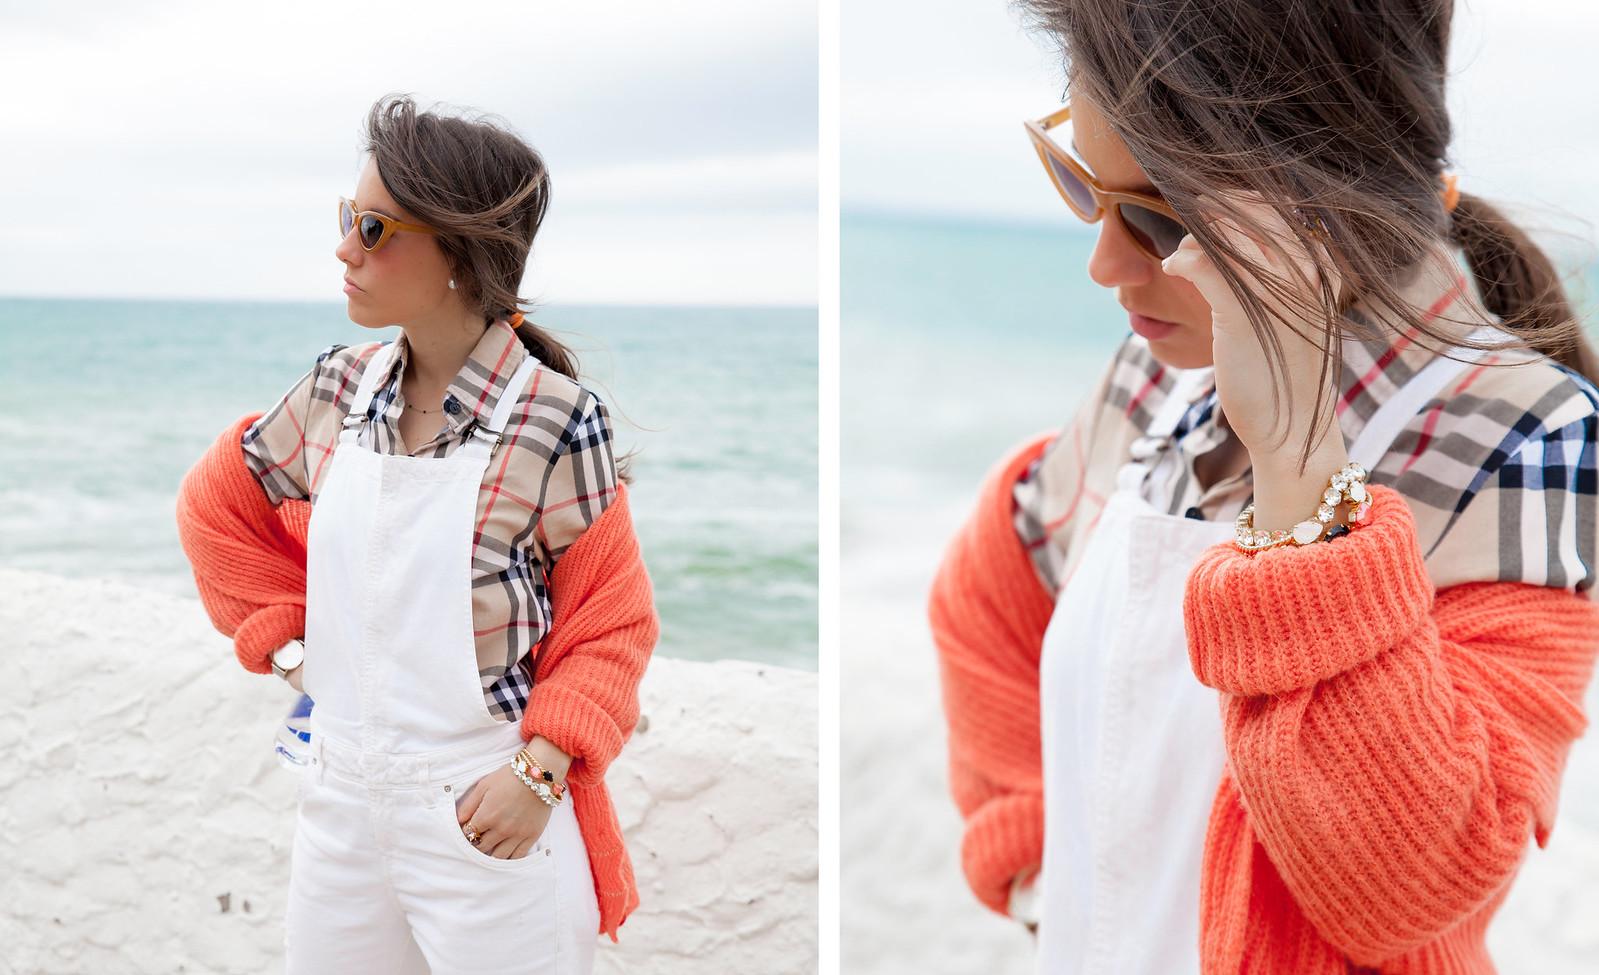 03_Burberry_Outfit_White_overall_Combinar_peto_con_tacones_mas34_theguestgirl_influencer_barcelona